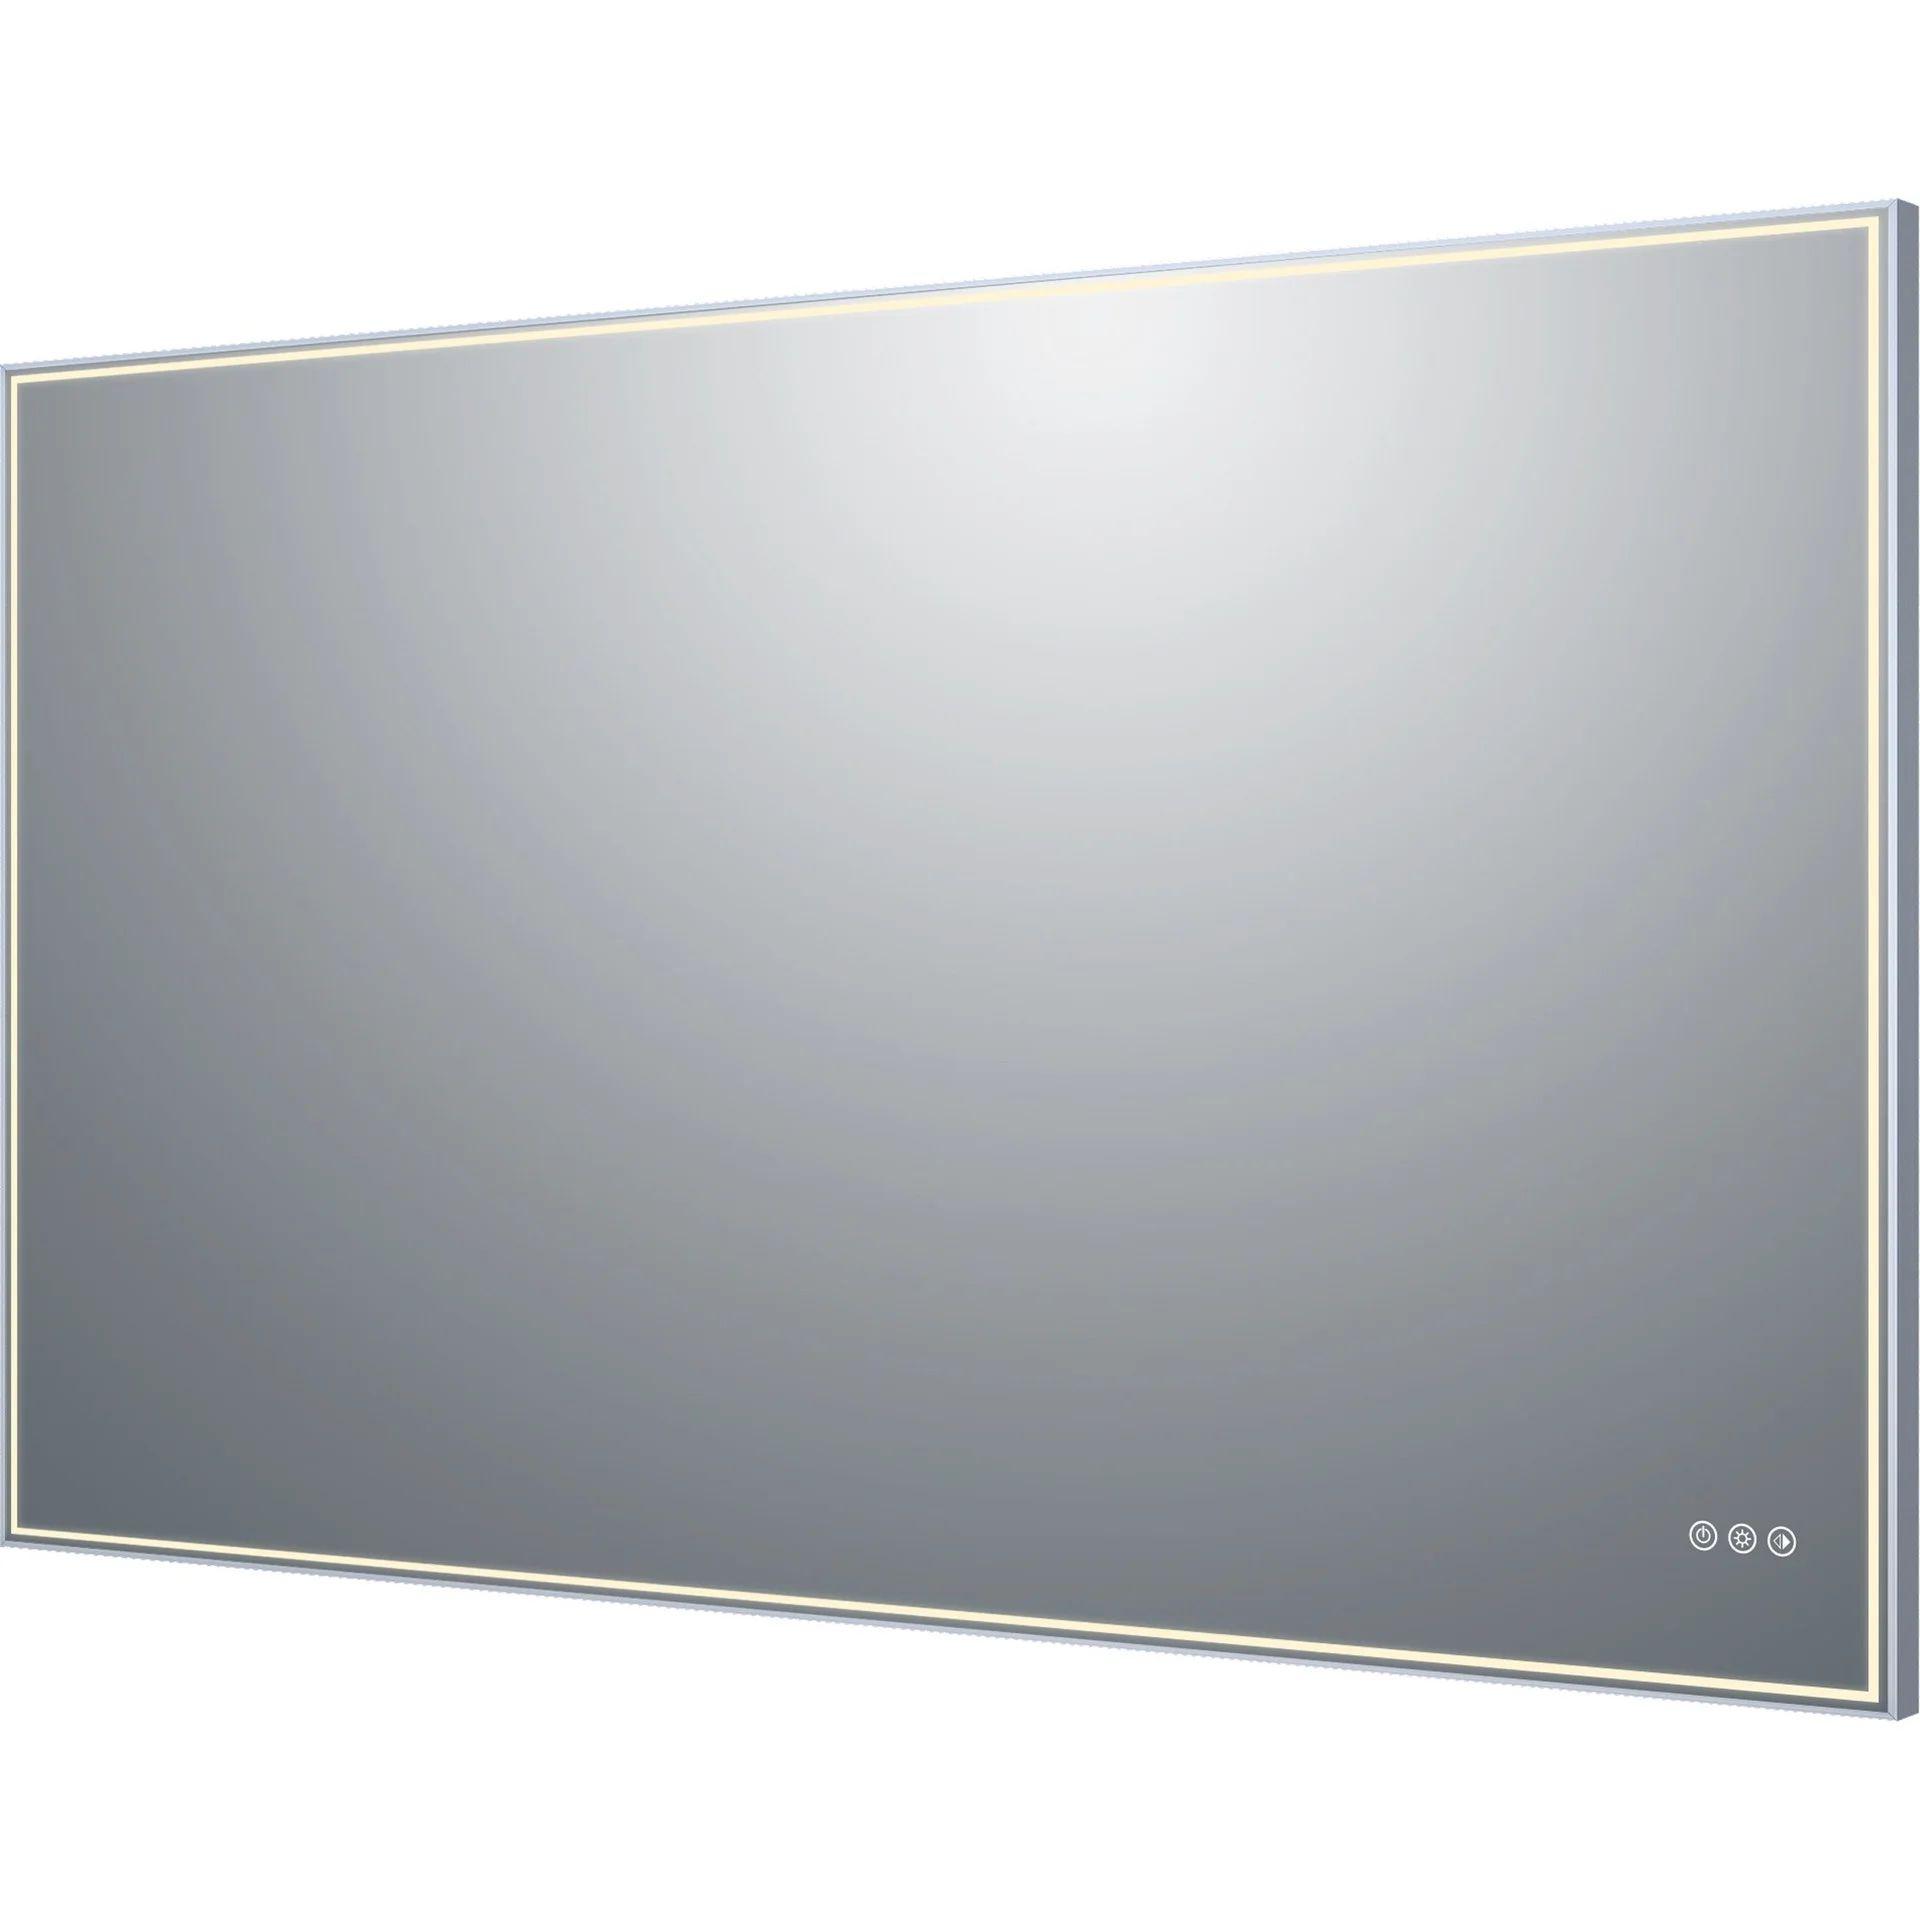 Miroir Lumineux Avec Eclairage Integre L 150 X H 90 Cm Neo Leroy Merlin